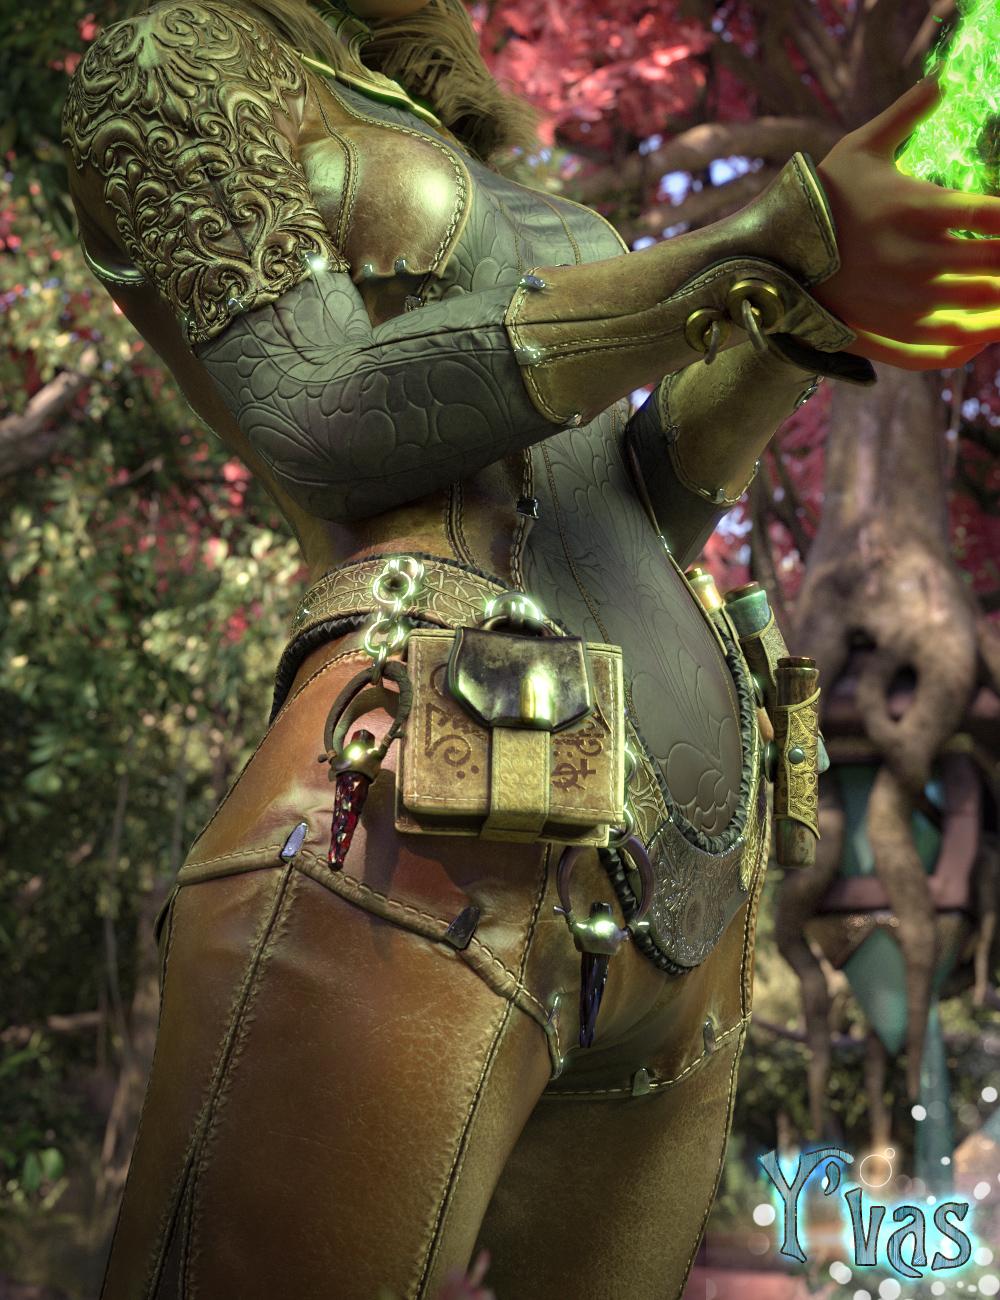 Y'vas Outfit for Genesis 8 Female by: Aeon Soul, 3D Models by Daz 3D